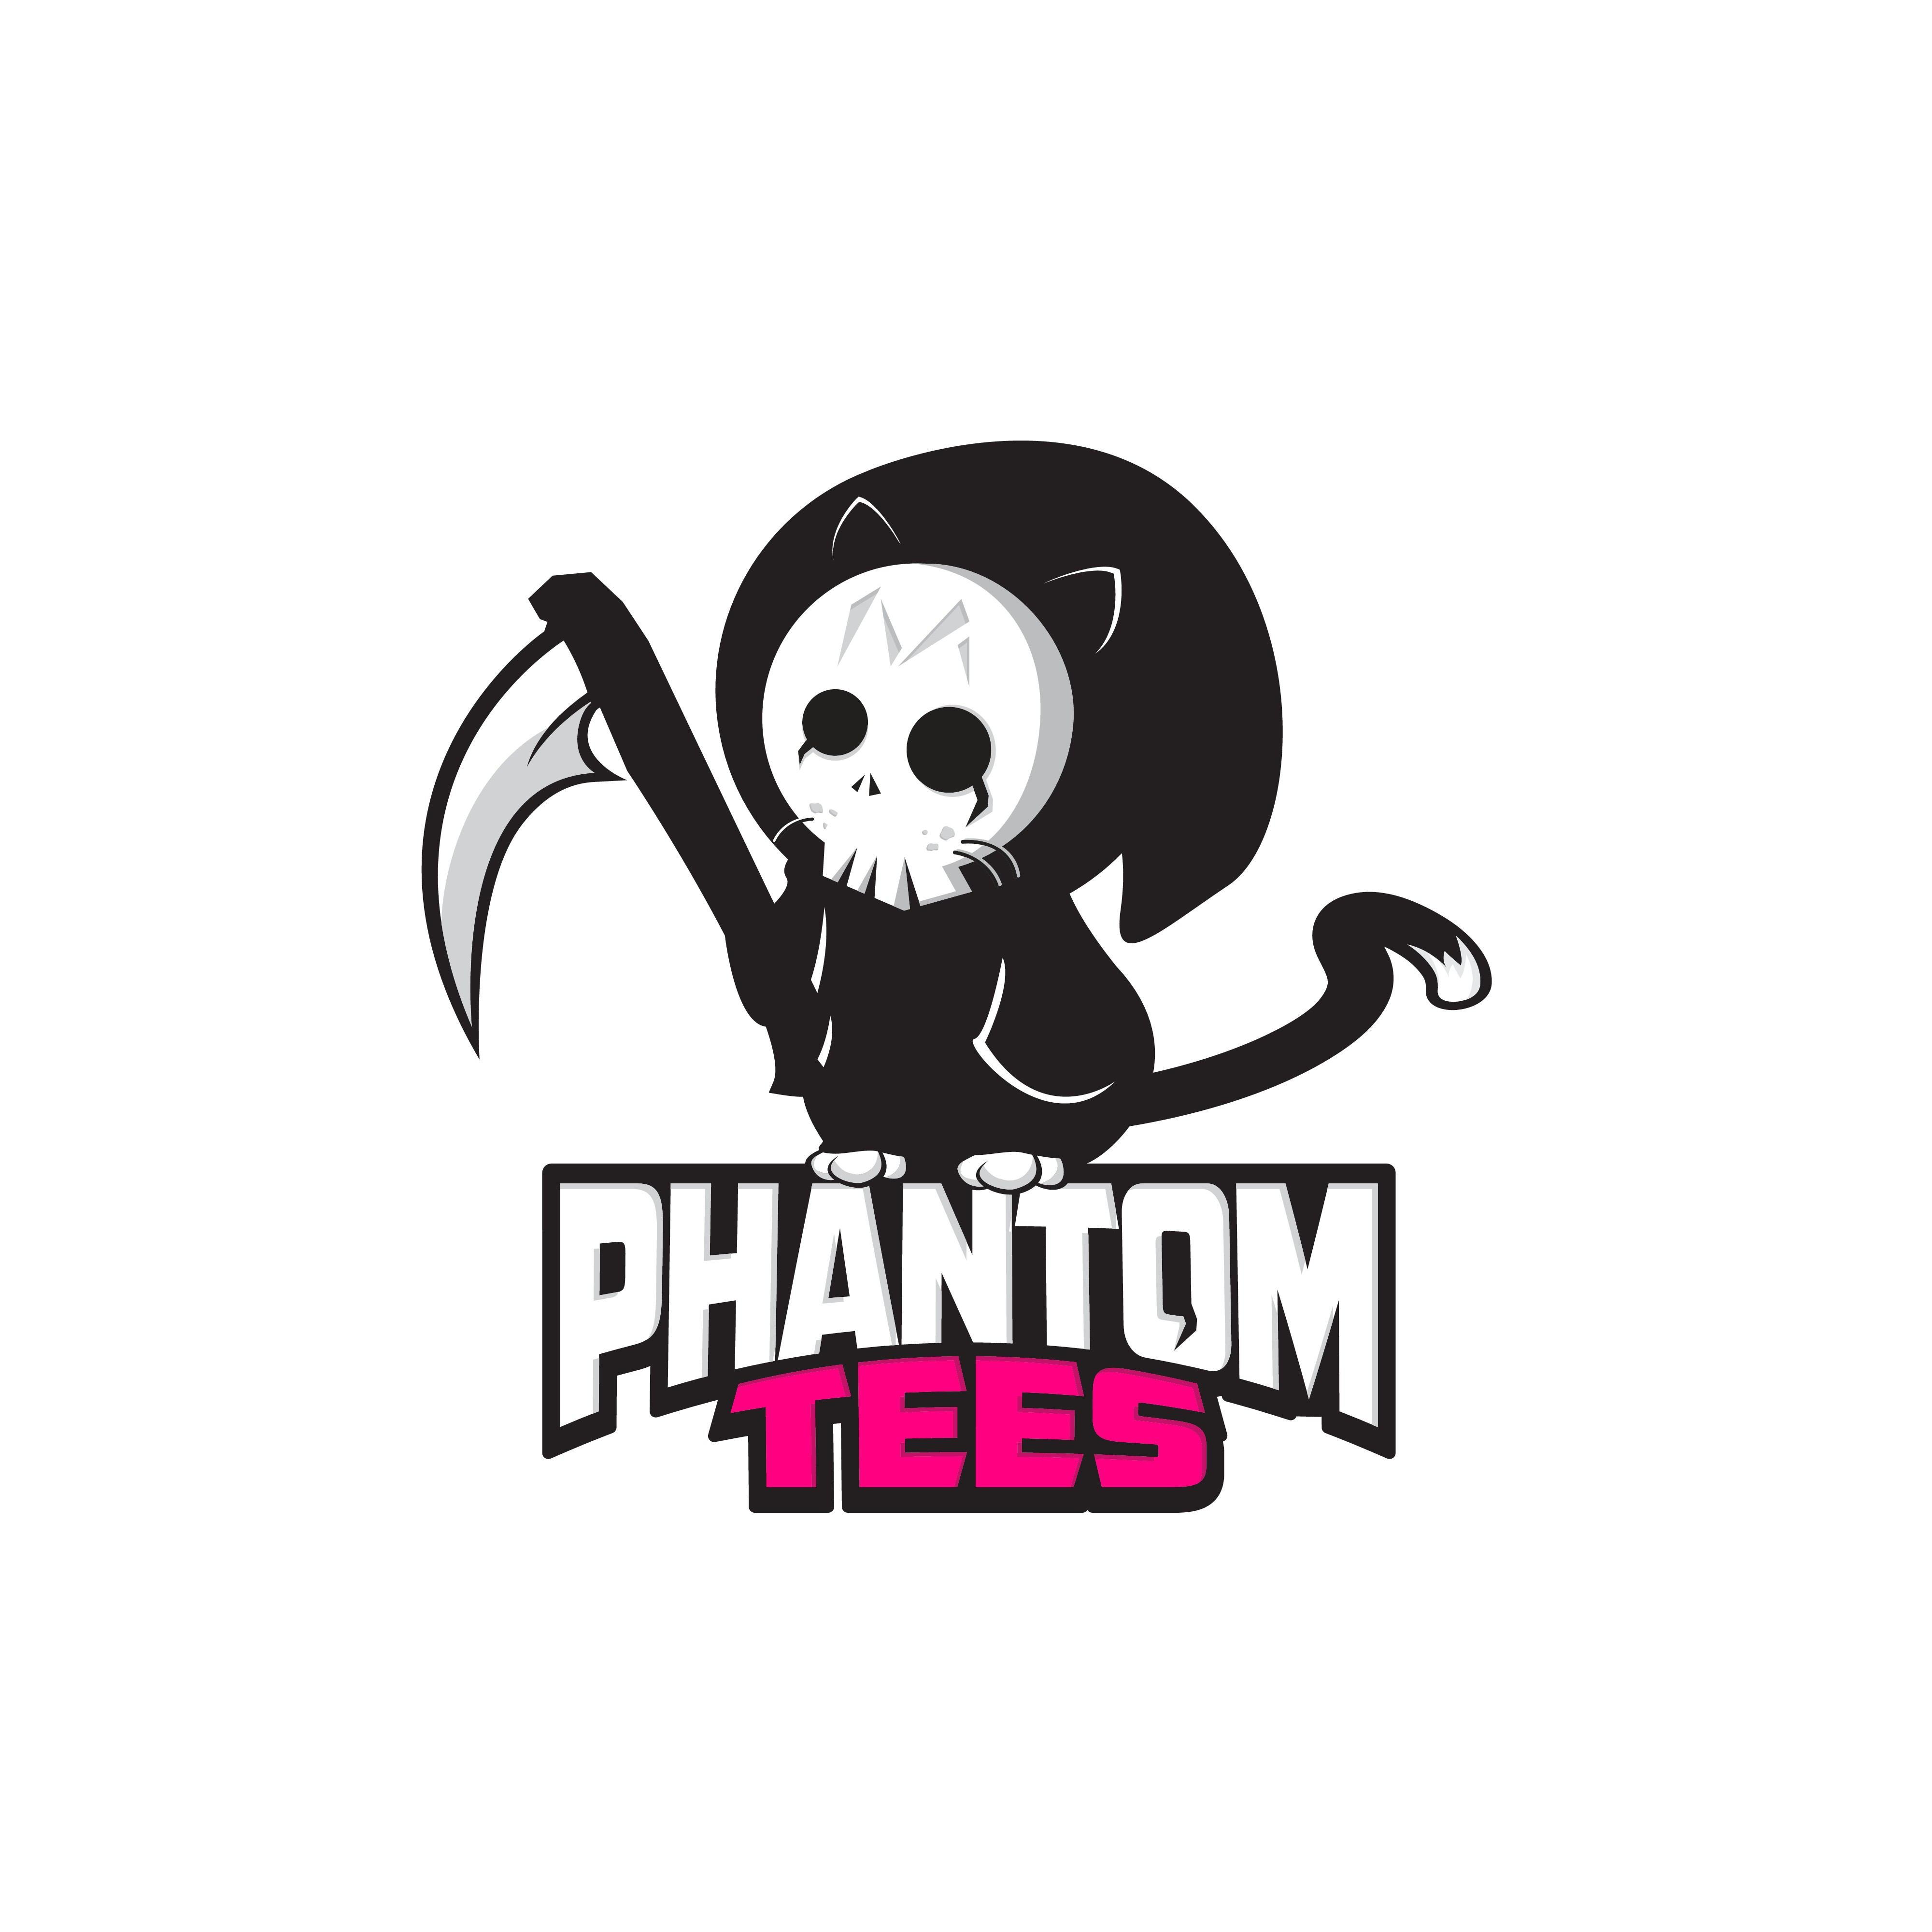 phantomTees: Harajuku Pop Meets Jason from Friday the 13th!